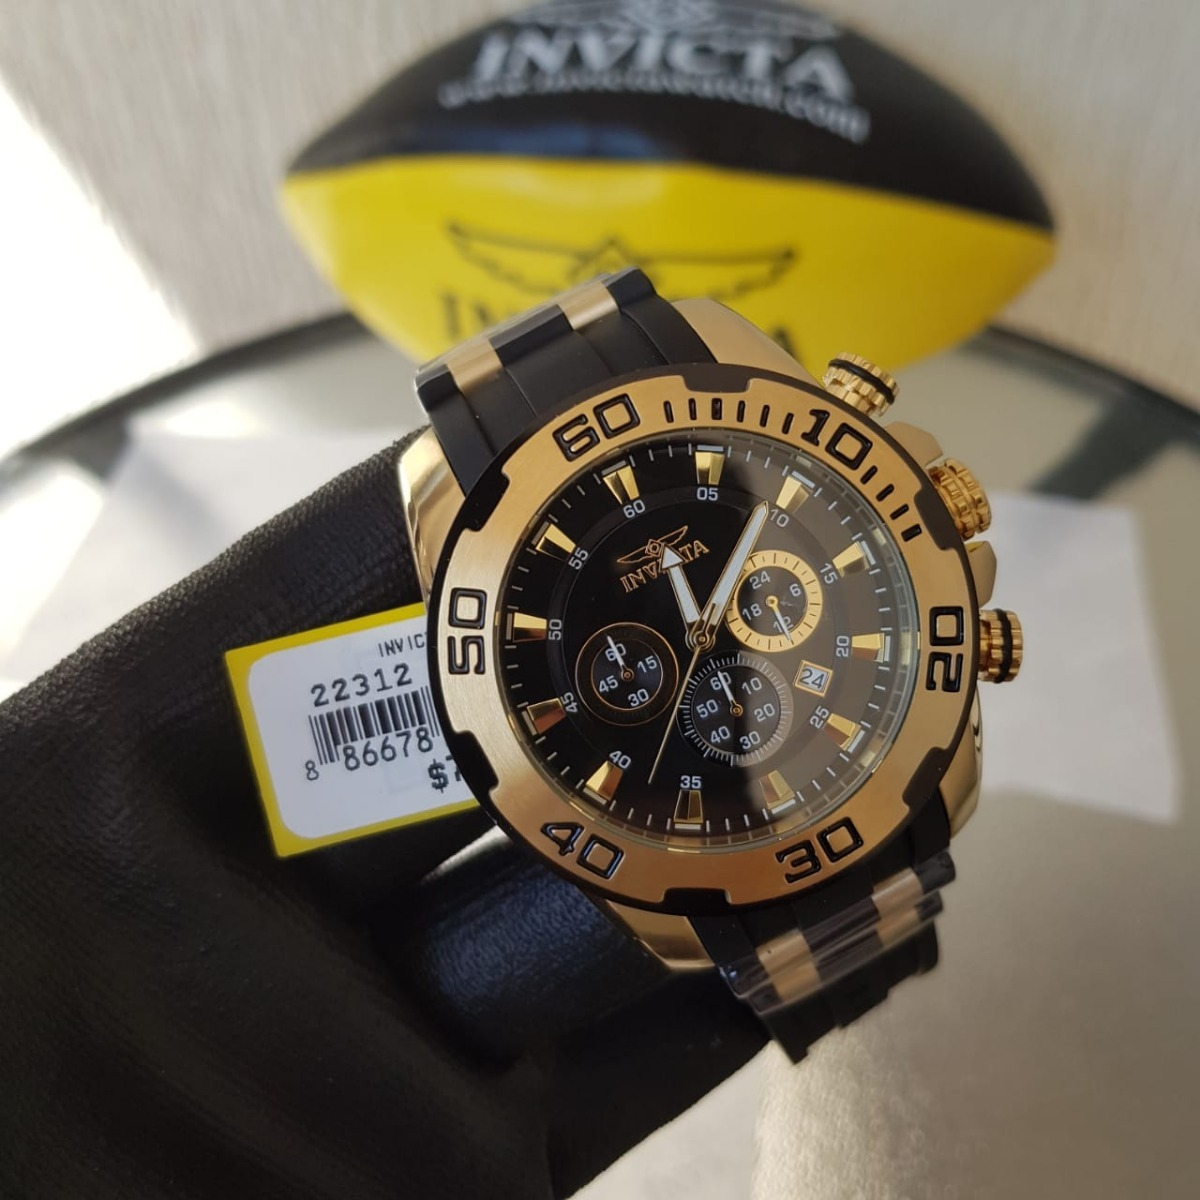 6d1048b69ba relógio invicta pro diver 22312 22340 dourado borracha preto. Carregando  zoom.